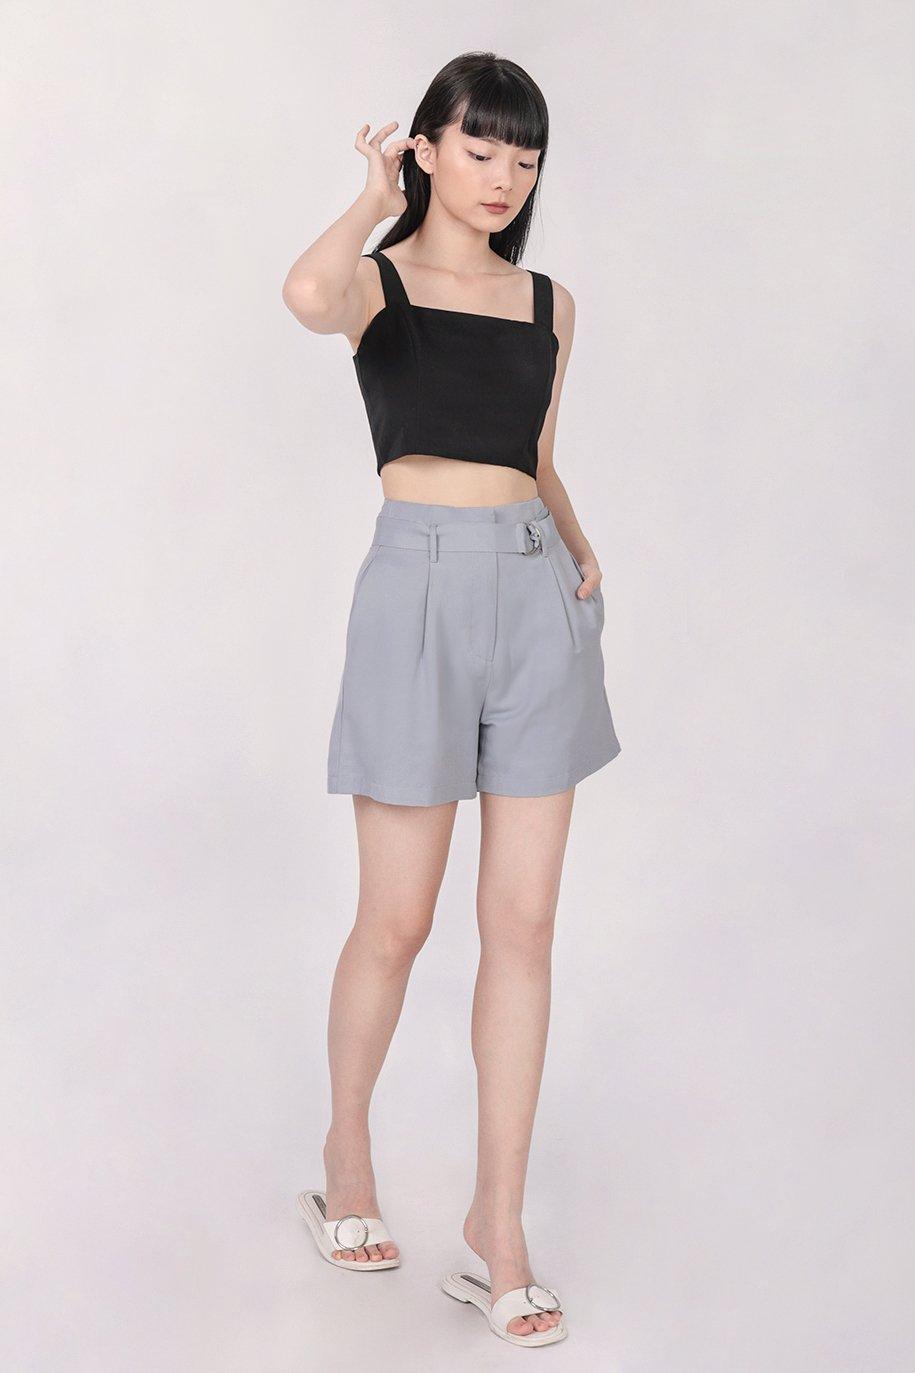 Harris Belted Shorts (Ash Blue)